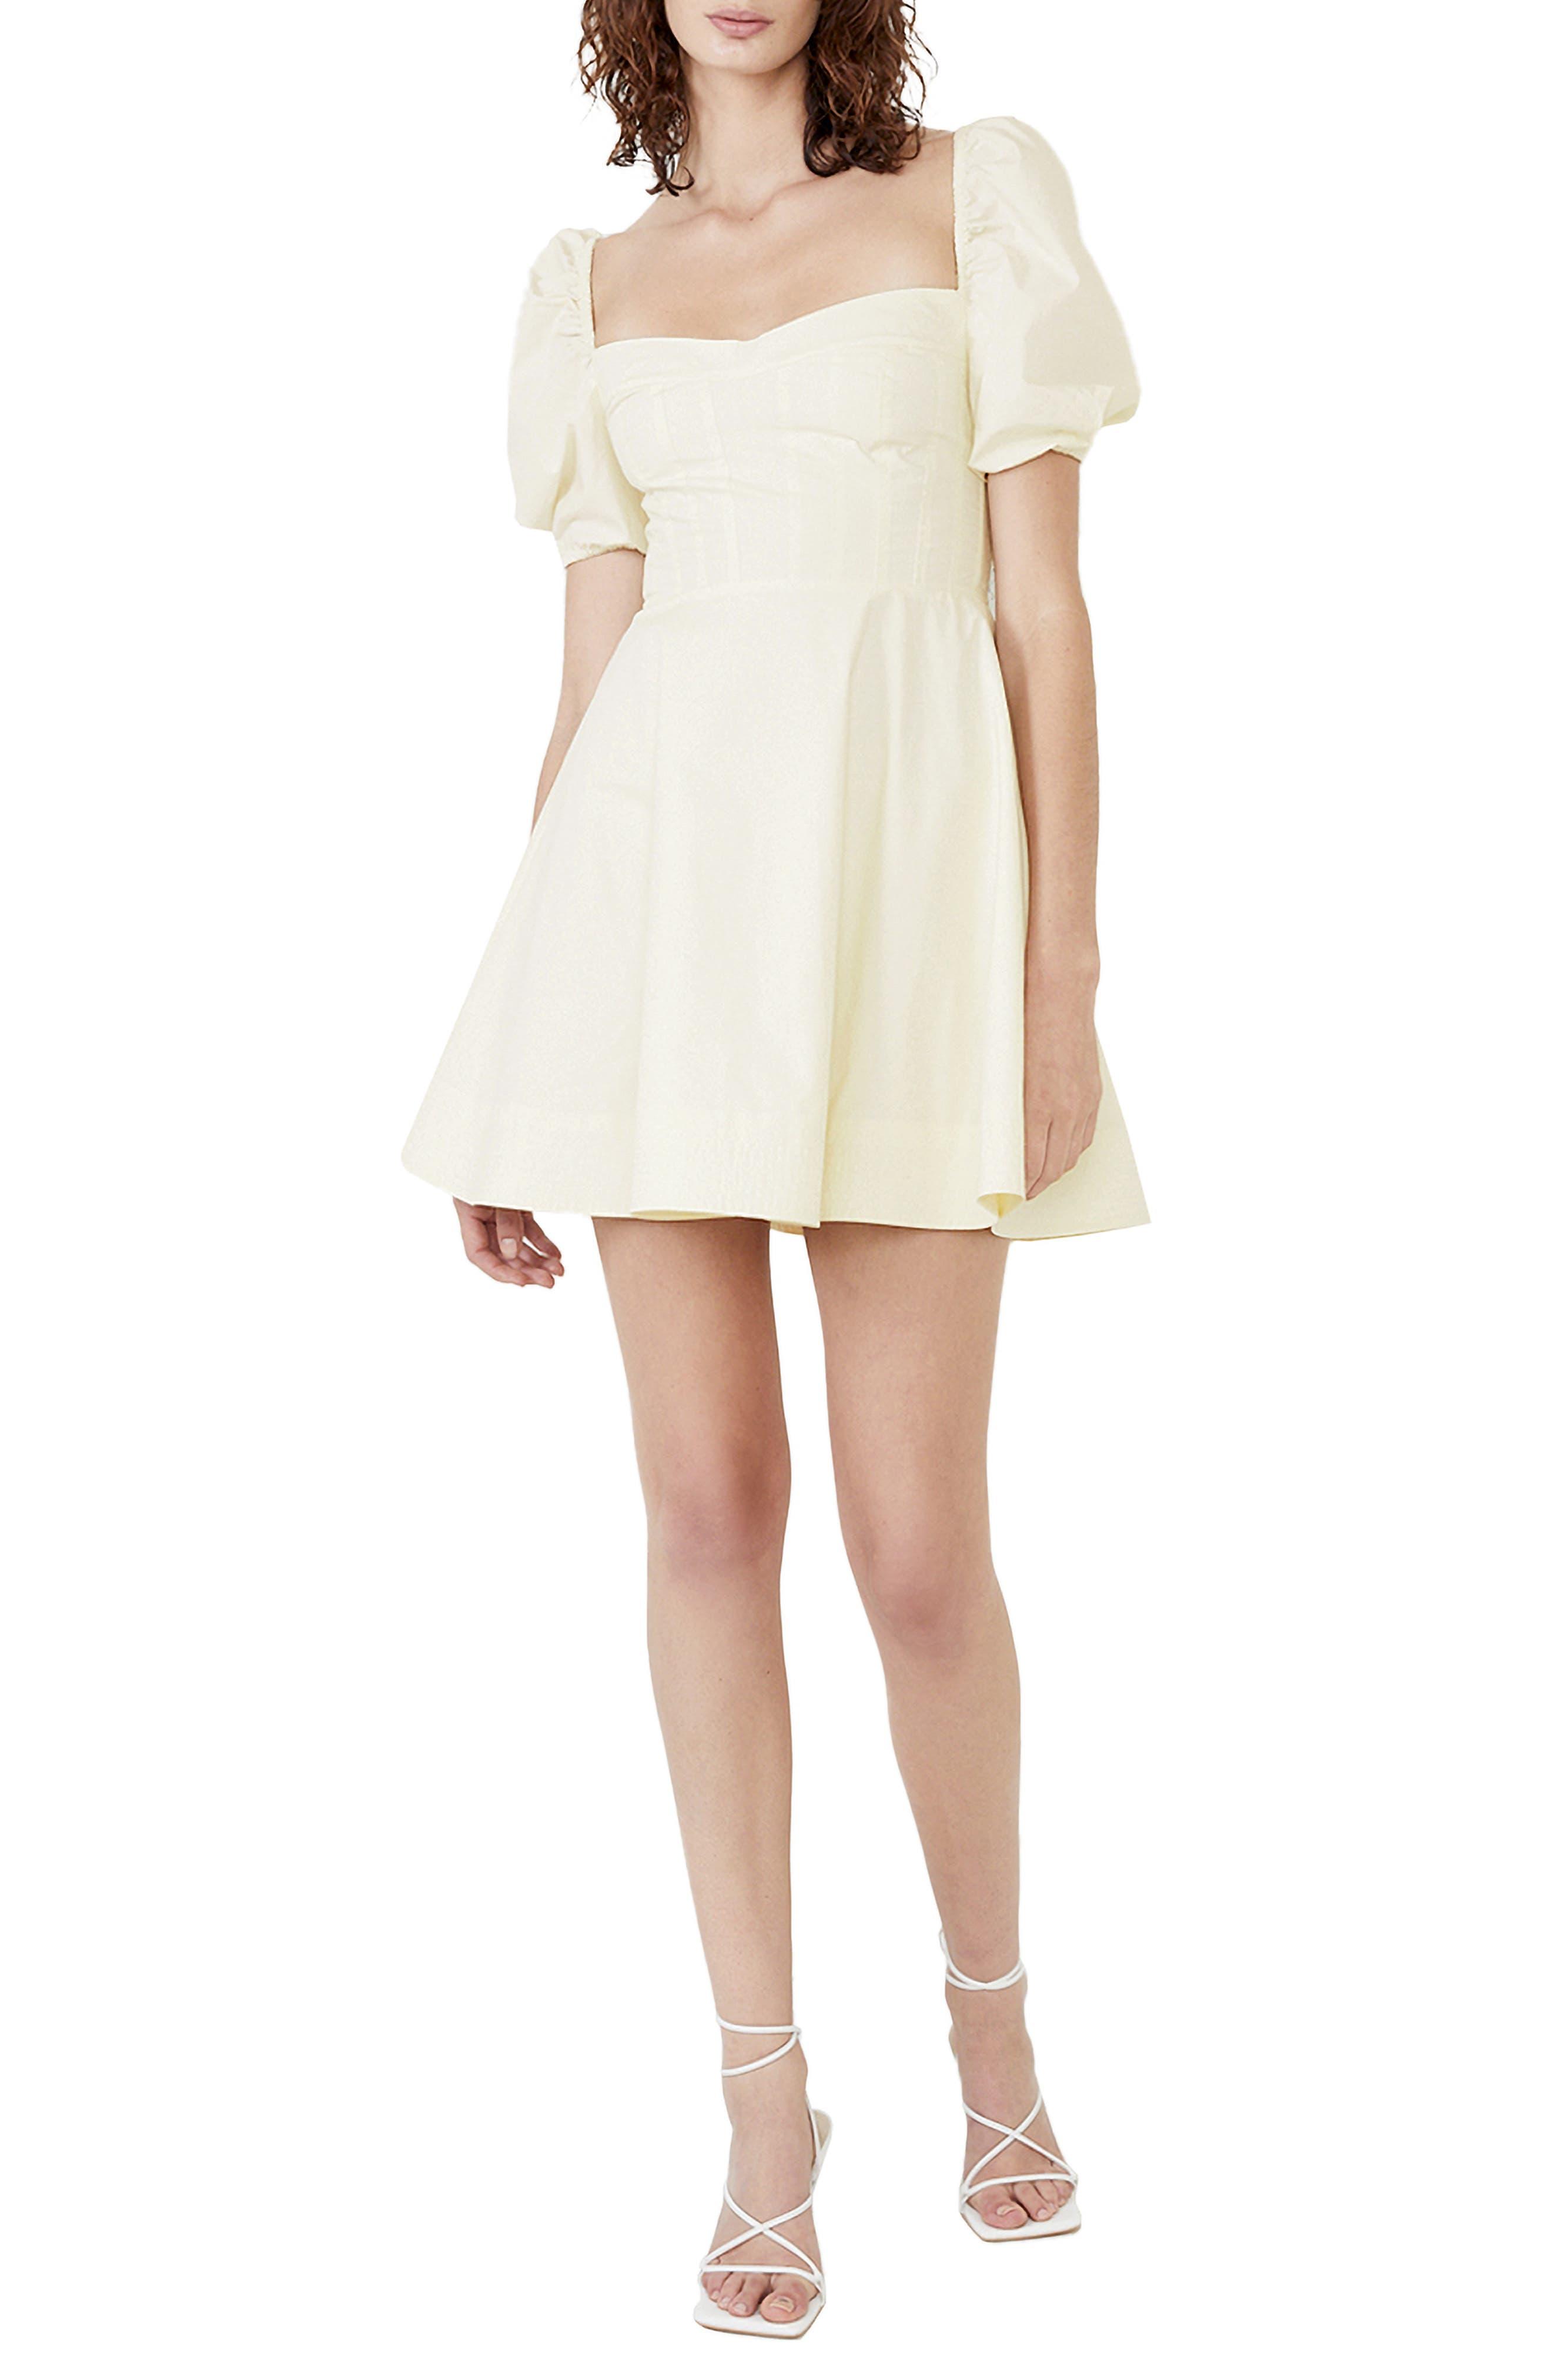 The Corset Staple Minidress